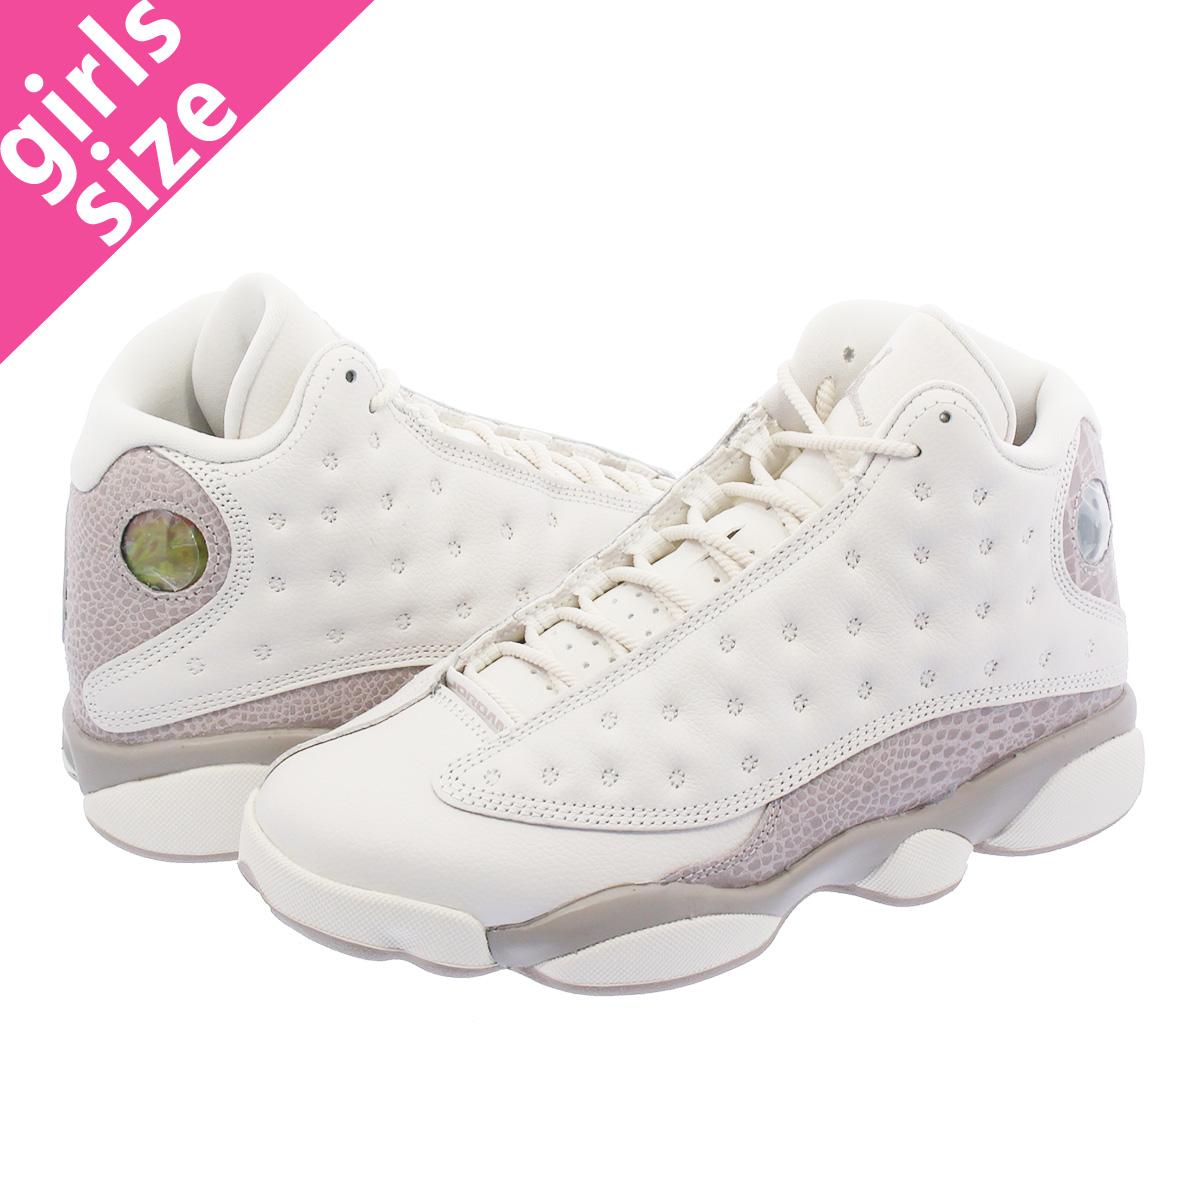 97cdb70d8d4d4f Women Air Jordan 13 Women Air Jordan 13 (xiii) Black Pink